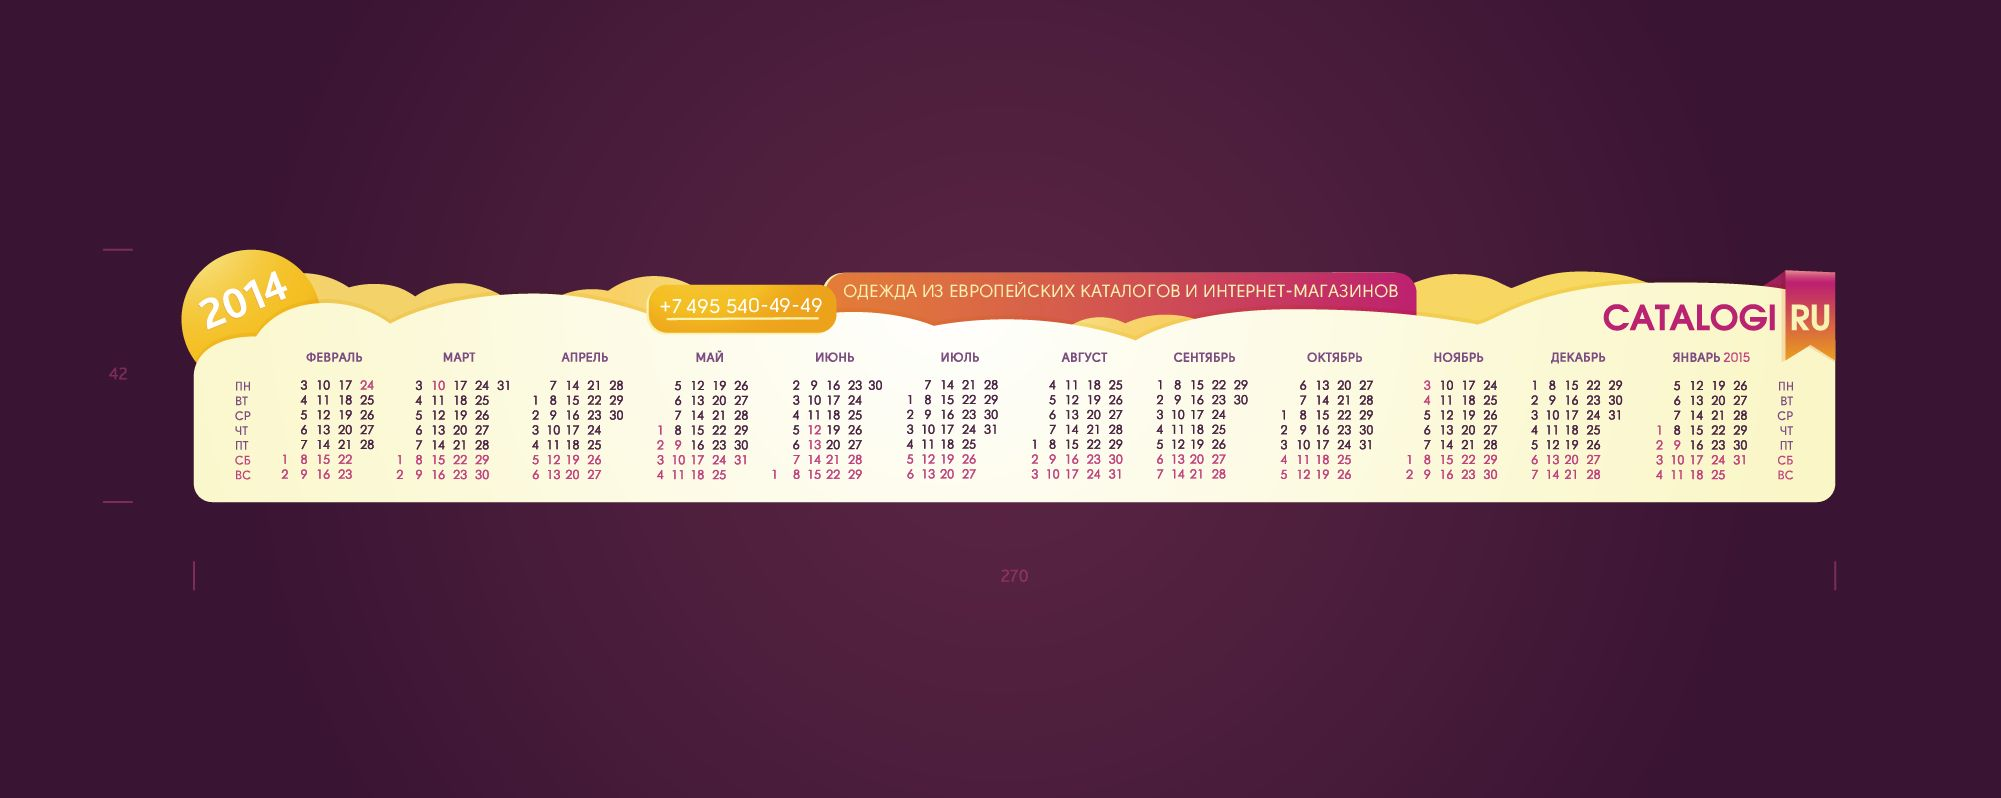 Календарик на монитор Catalogi.ru - дизайнер e5en